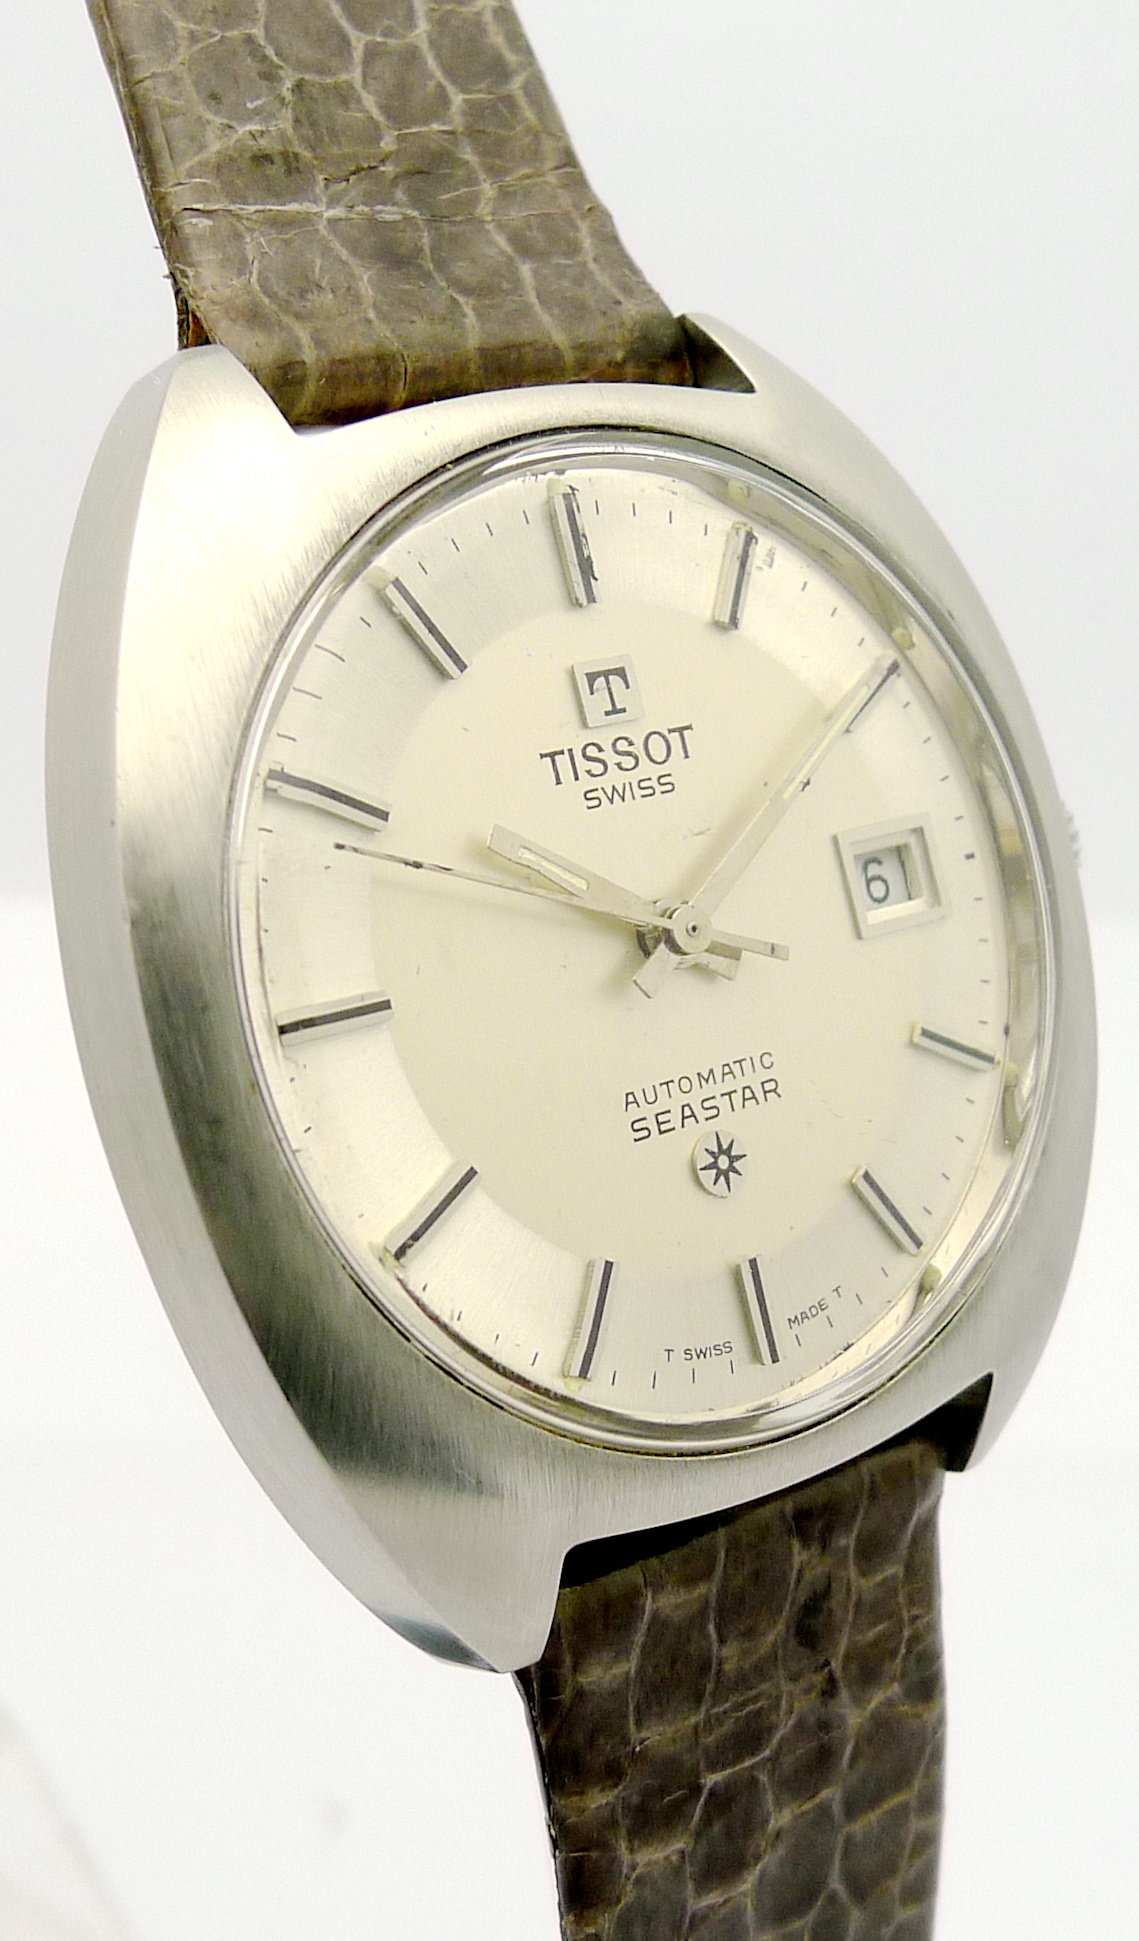 tissot seastar stahl herren automatik armbanduhr aus den 70er jahre ebay. Black Bedroom Furniture Sets. Home Design Ideas